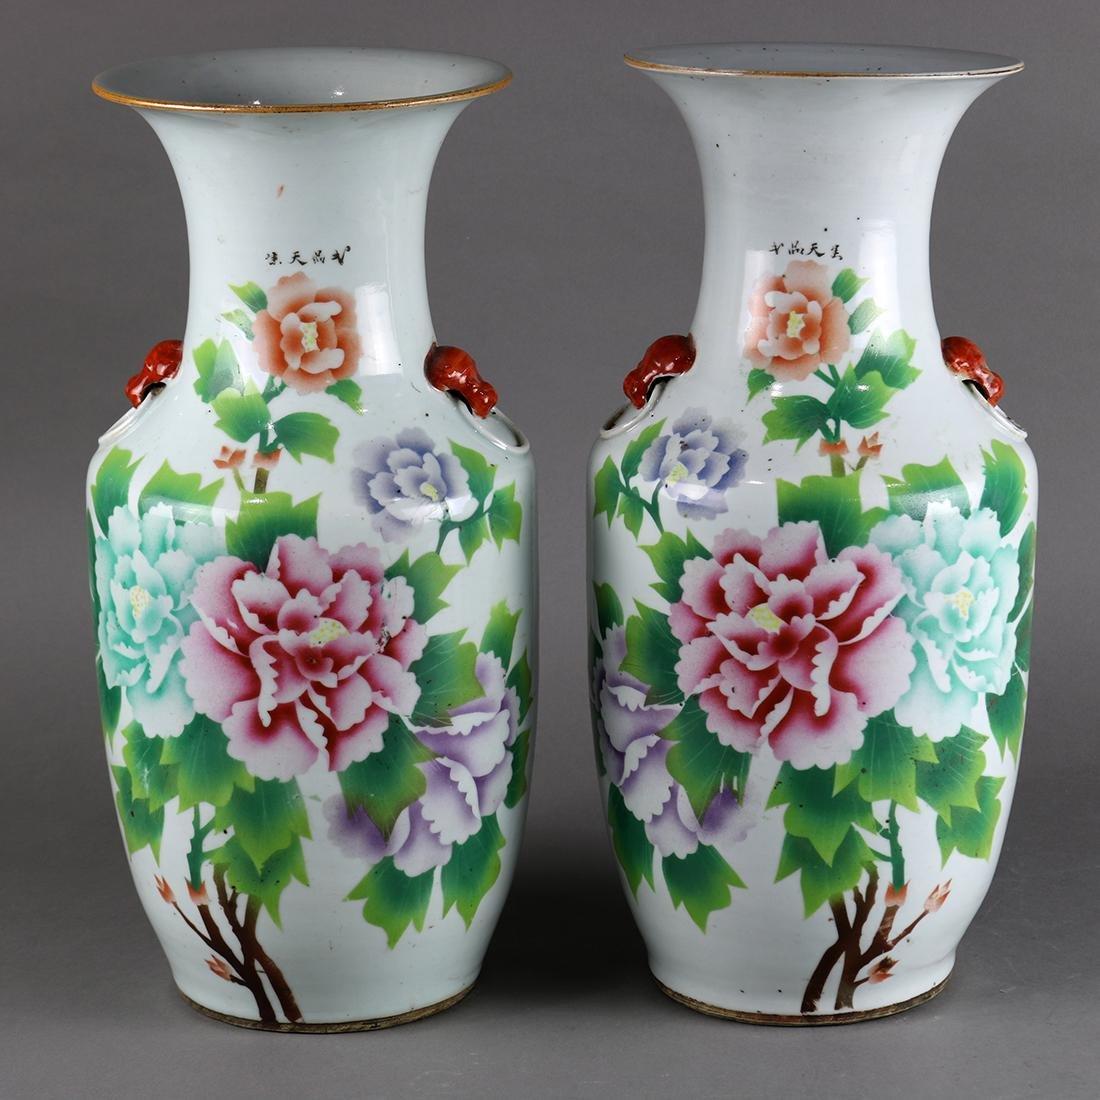 Chinese Porcelain Vases, Peonies